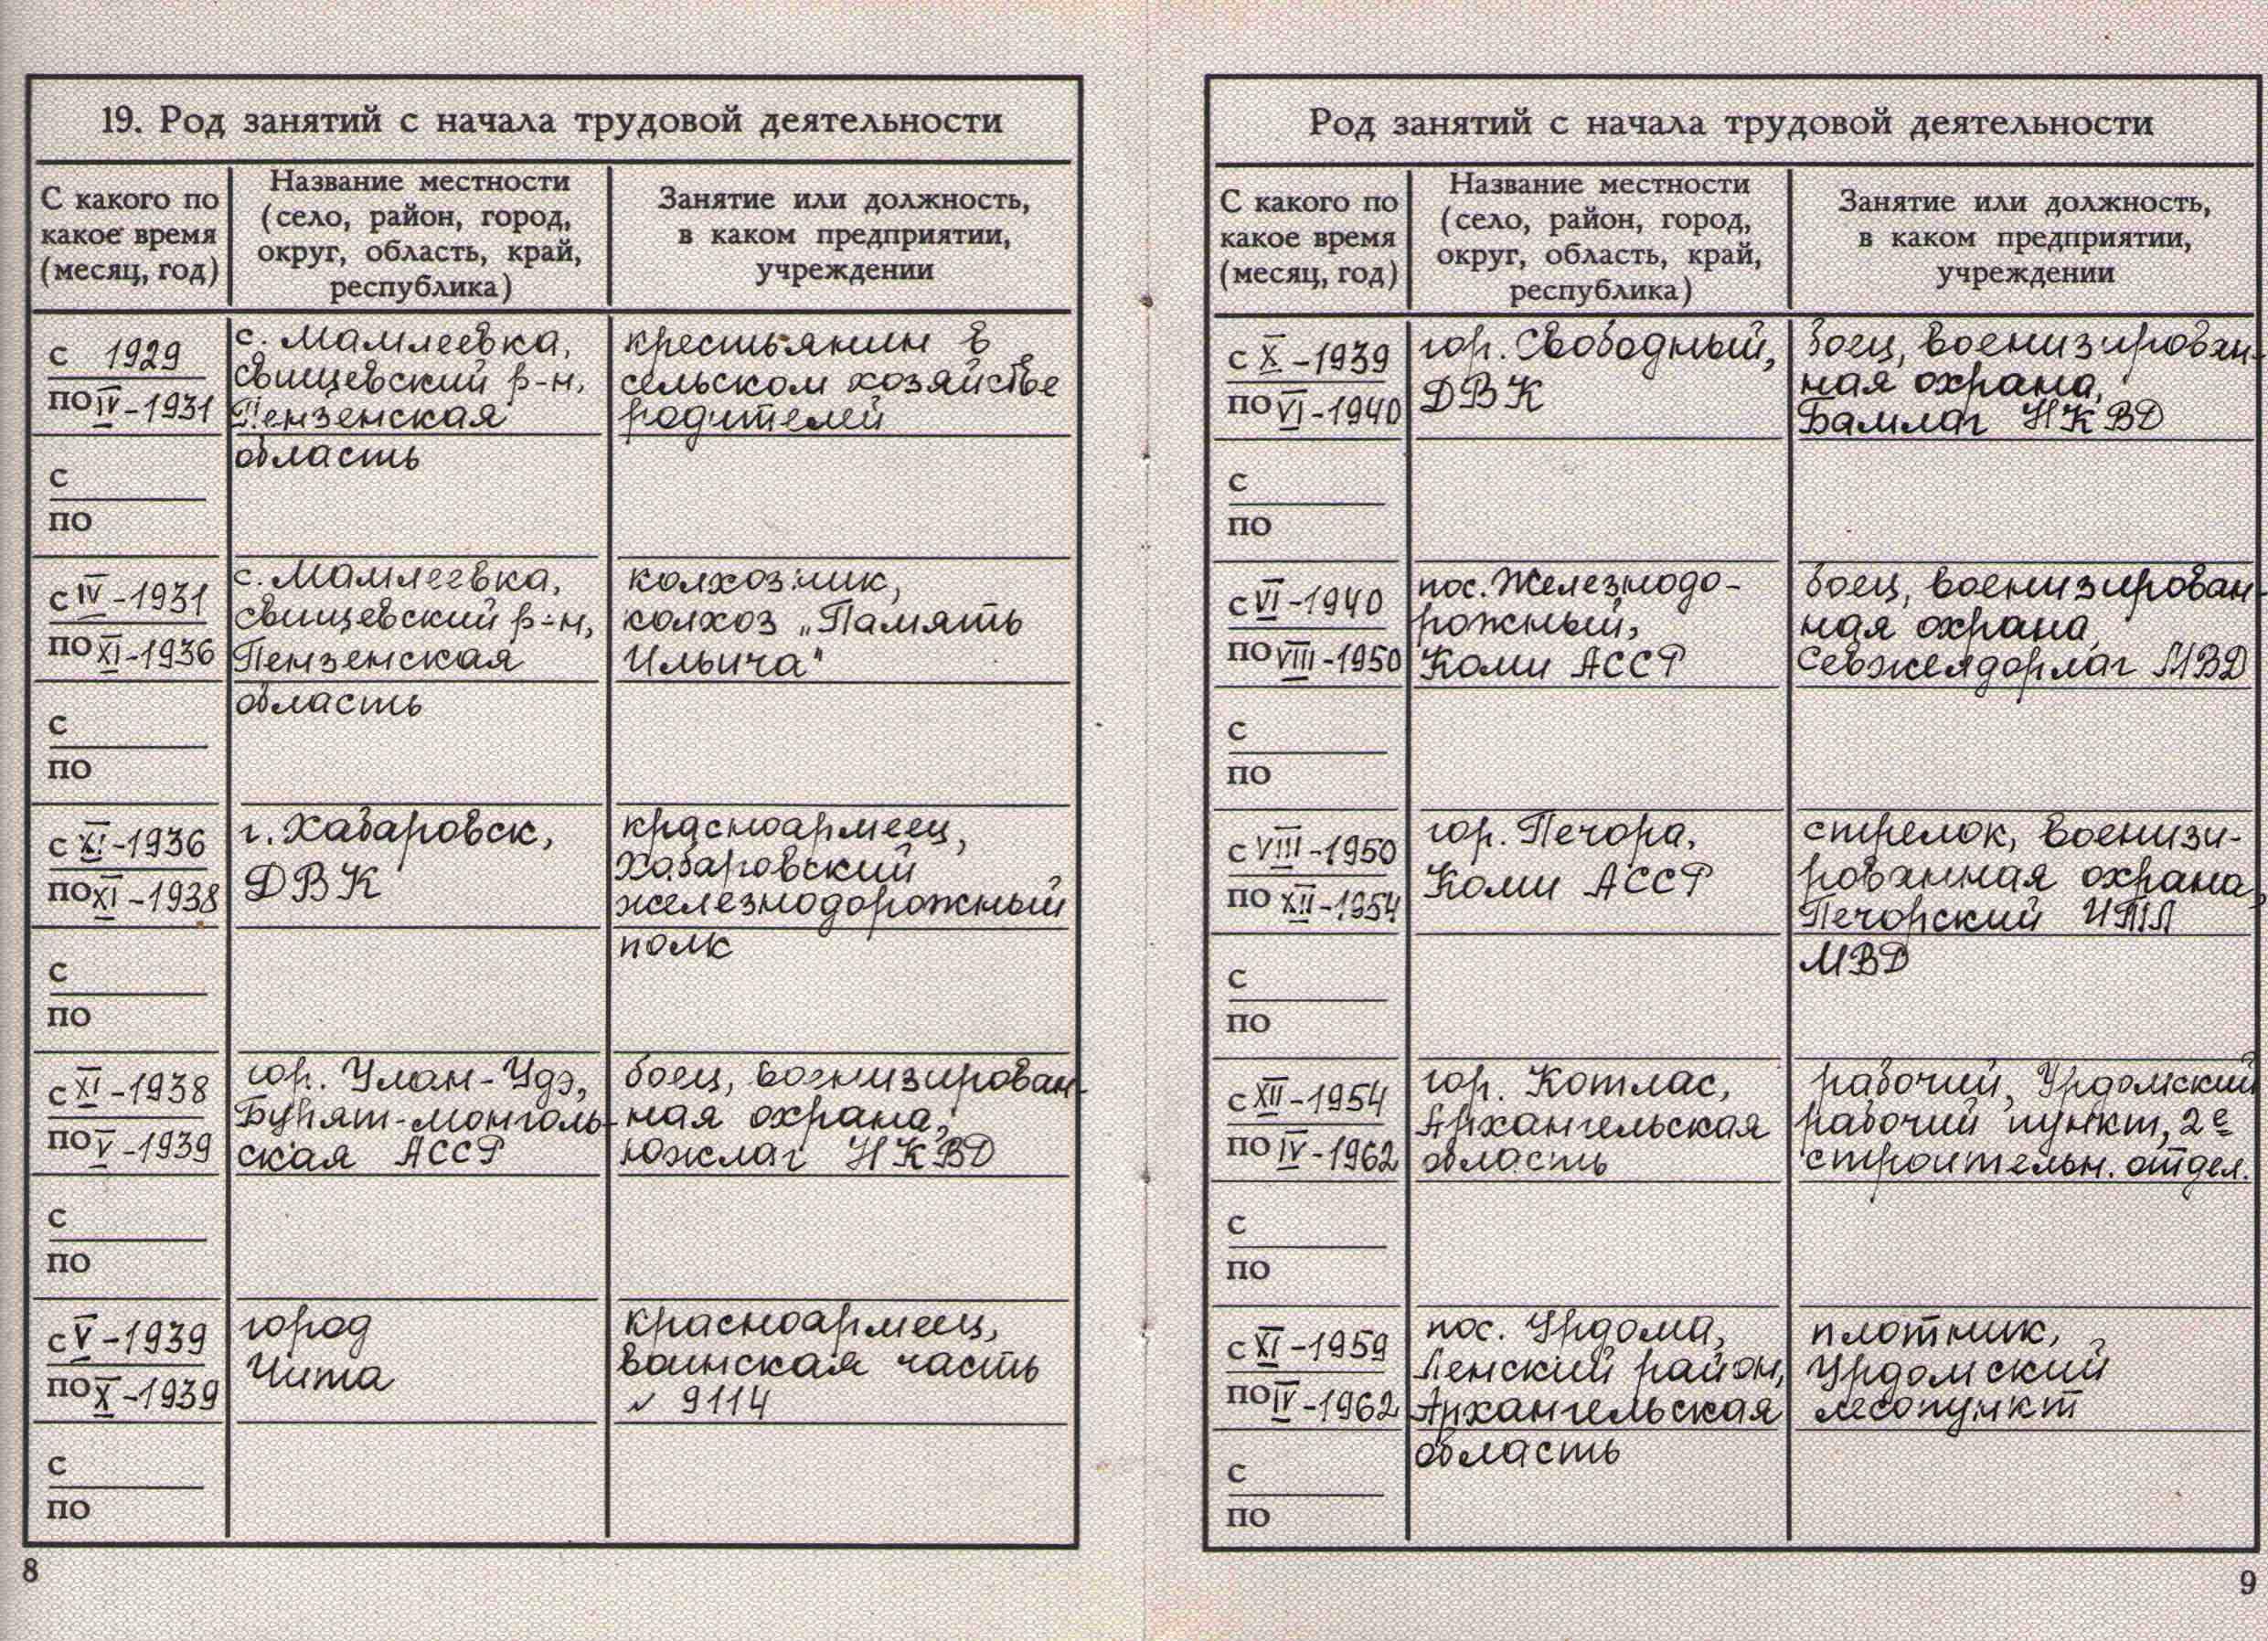 83. Учетная карточка члена партии Барыкина ПП, 1974.